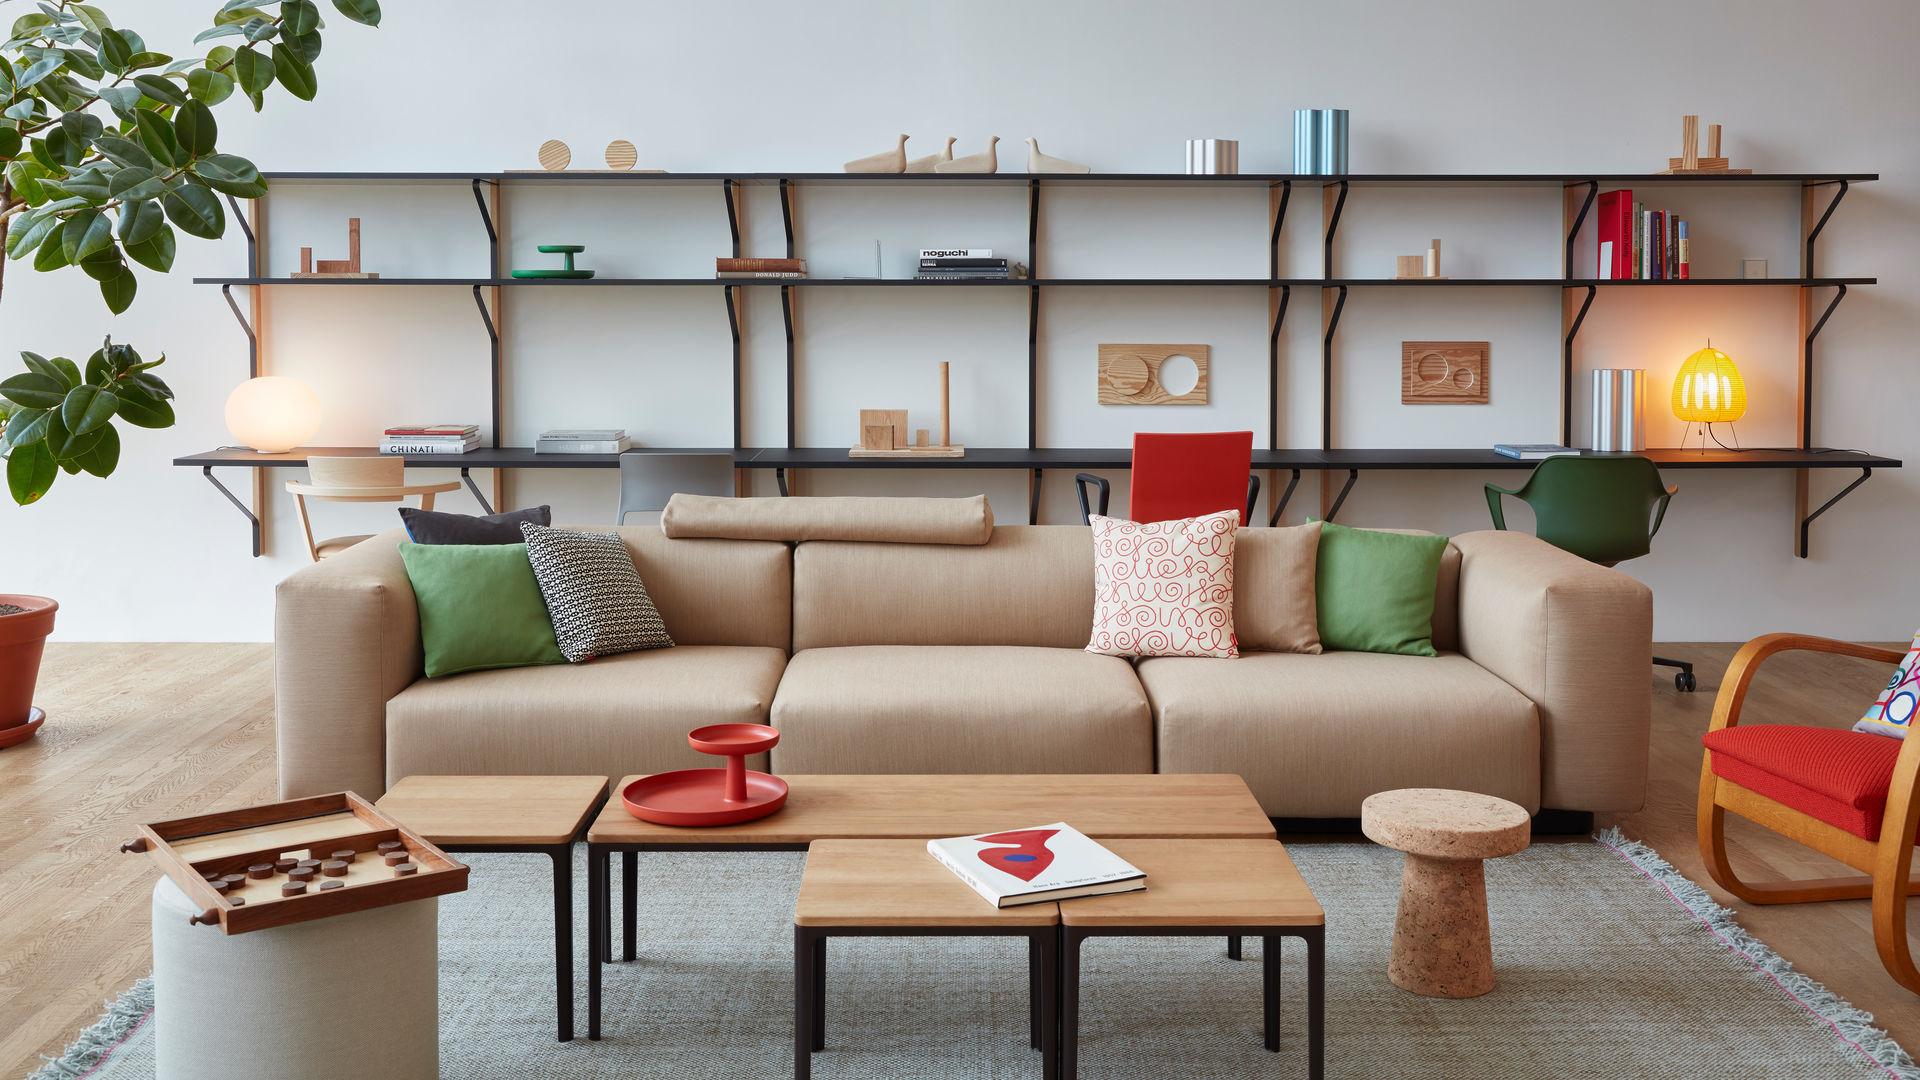 vitra jasper morrison vitrahaus level 1. Black Bedroom Furniture Sets. Home Design Ideas